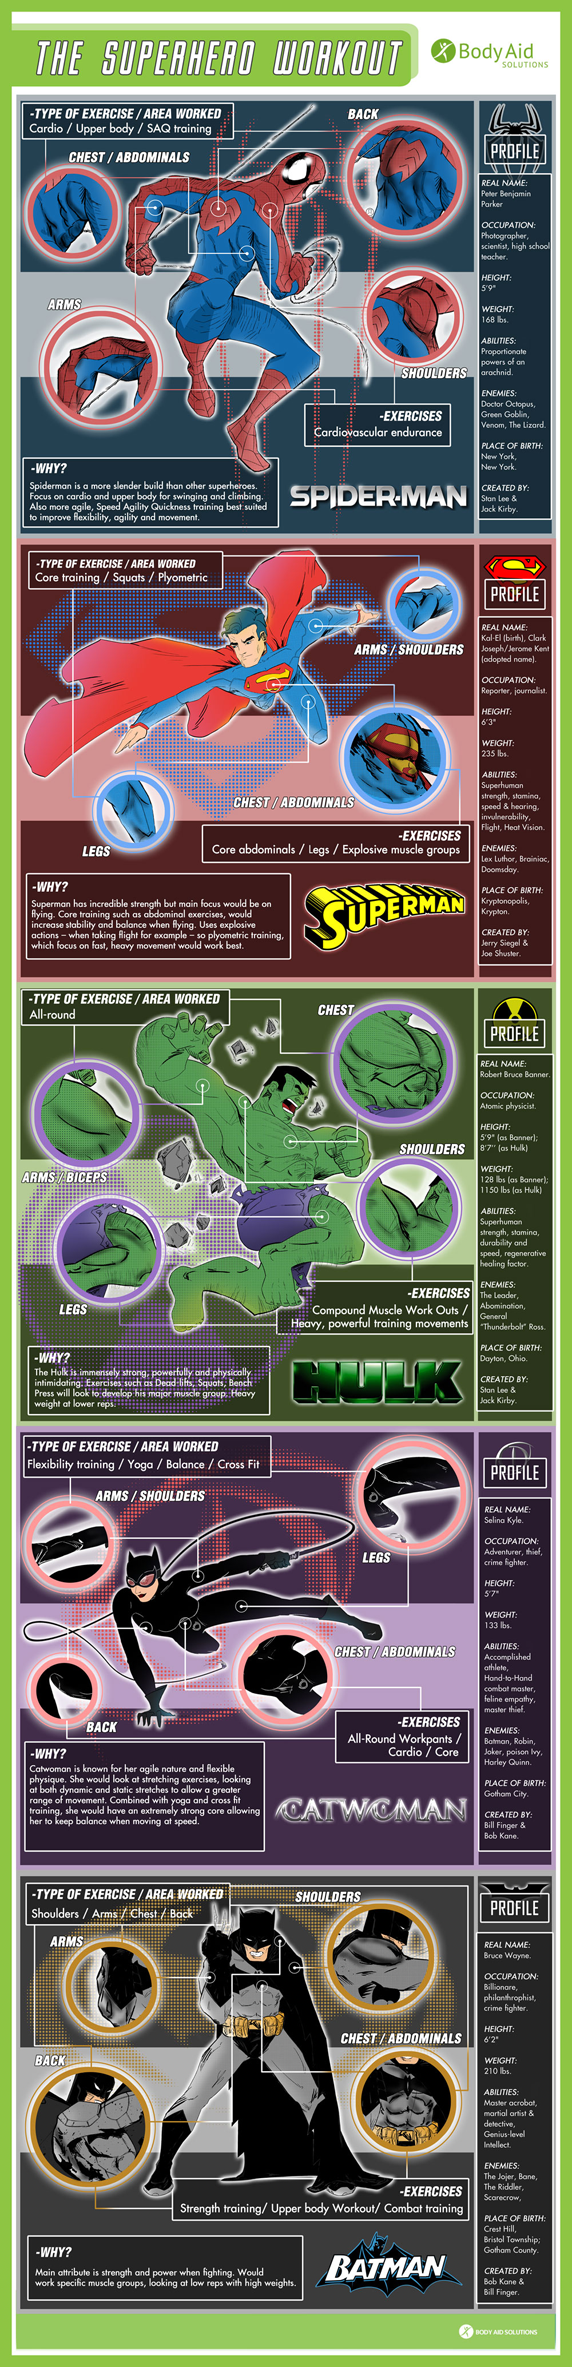 The Superhero Workout